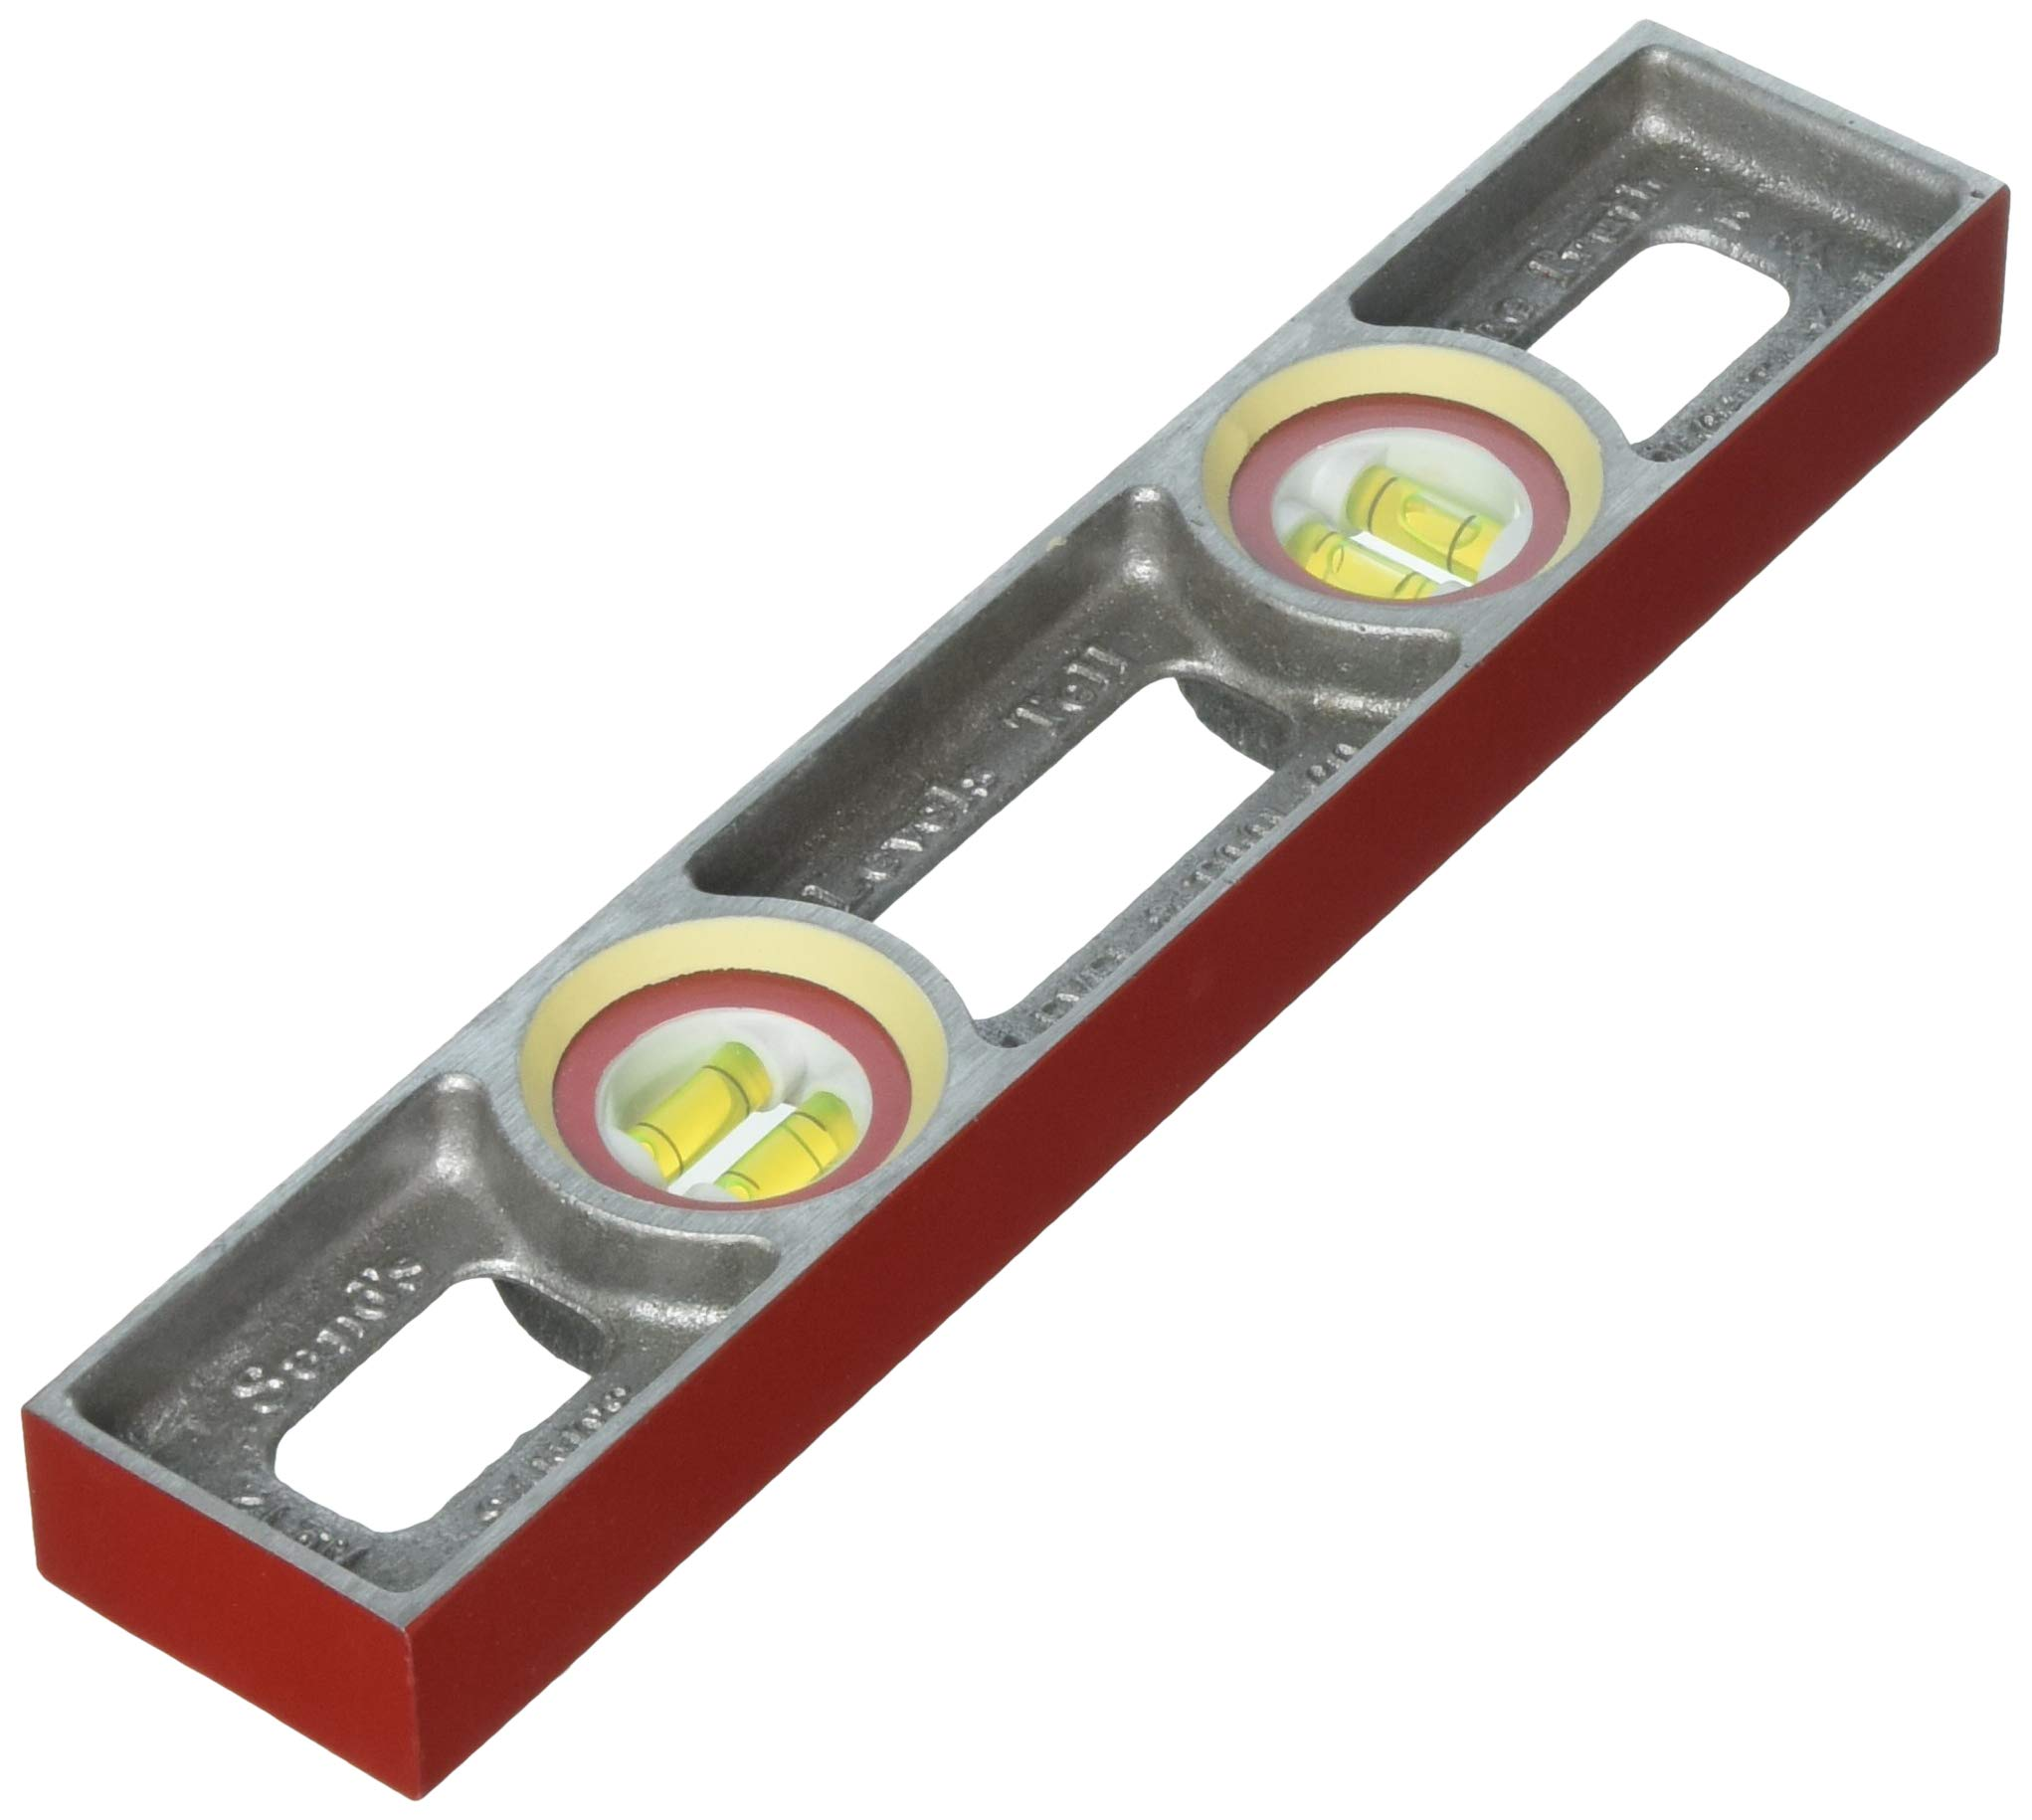 Sands Level & Tool SL1212 Professional Cast Aluminum Level, 12-Inch